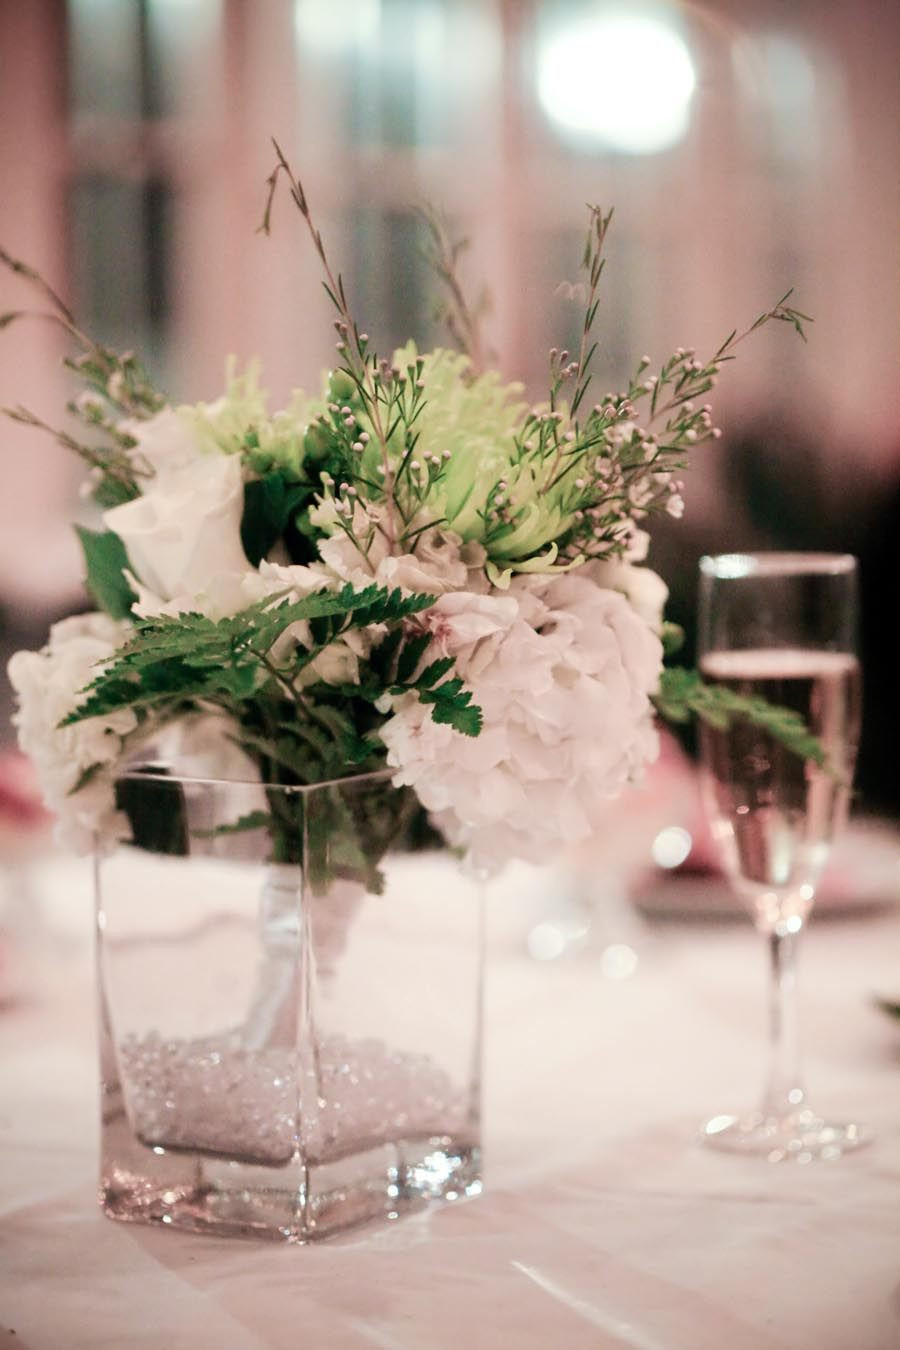 Round Vase Flower Arrangements Of Simple Flower Arrangements for Tables Luxury Vases Vase Centerpieces for Related Post